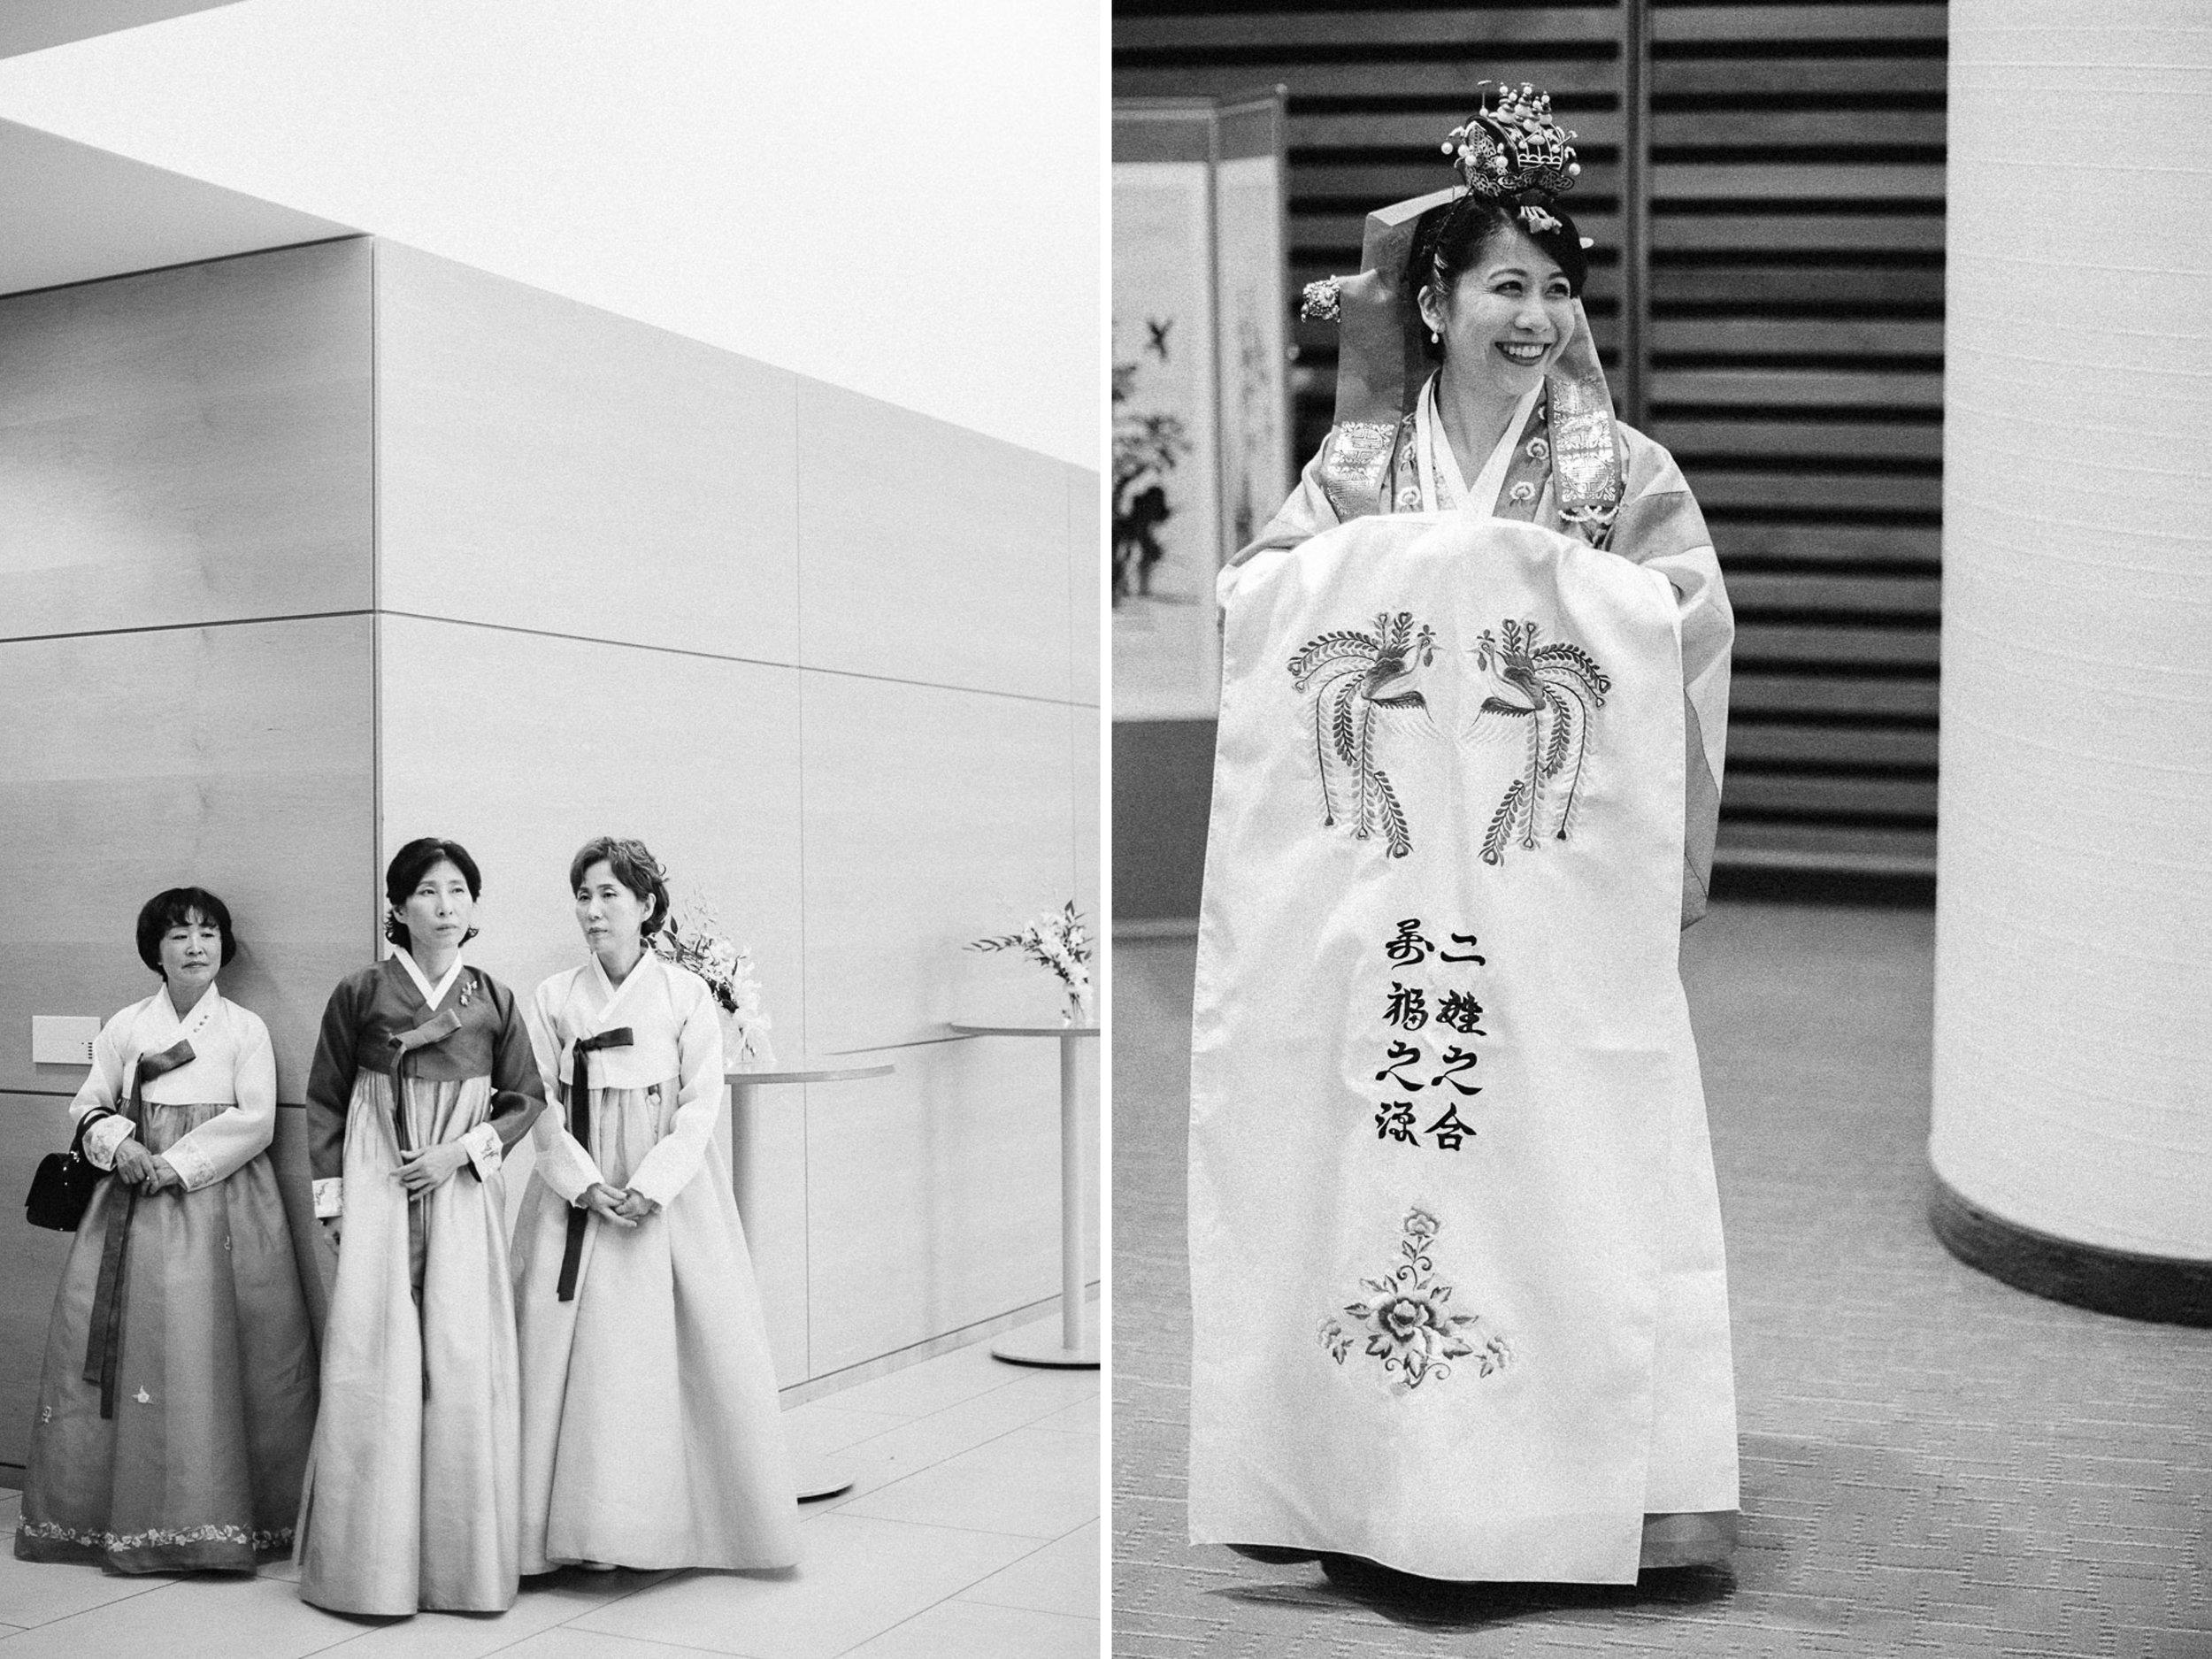 toronto_wedding_photographer_reference_library15.jpg